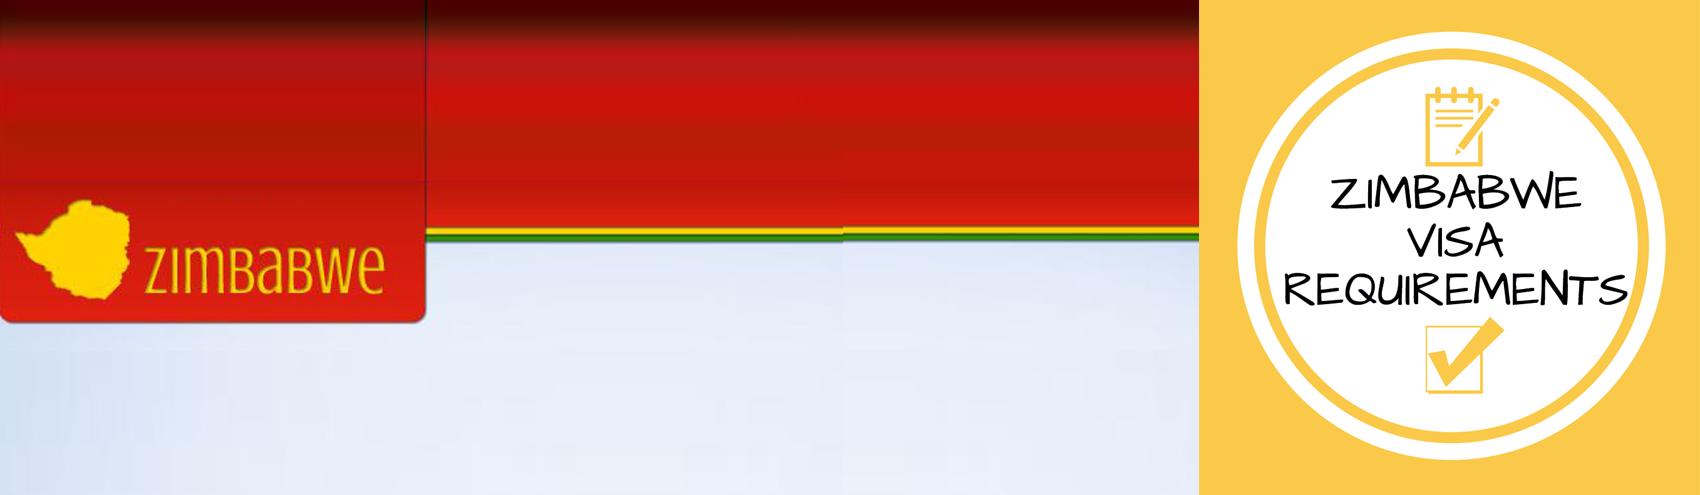 Zimbabwe_Visa_Requirements